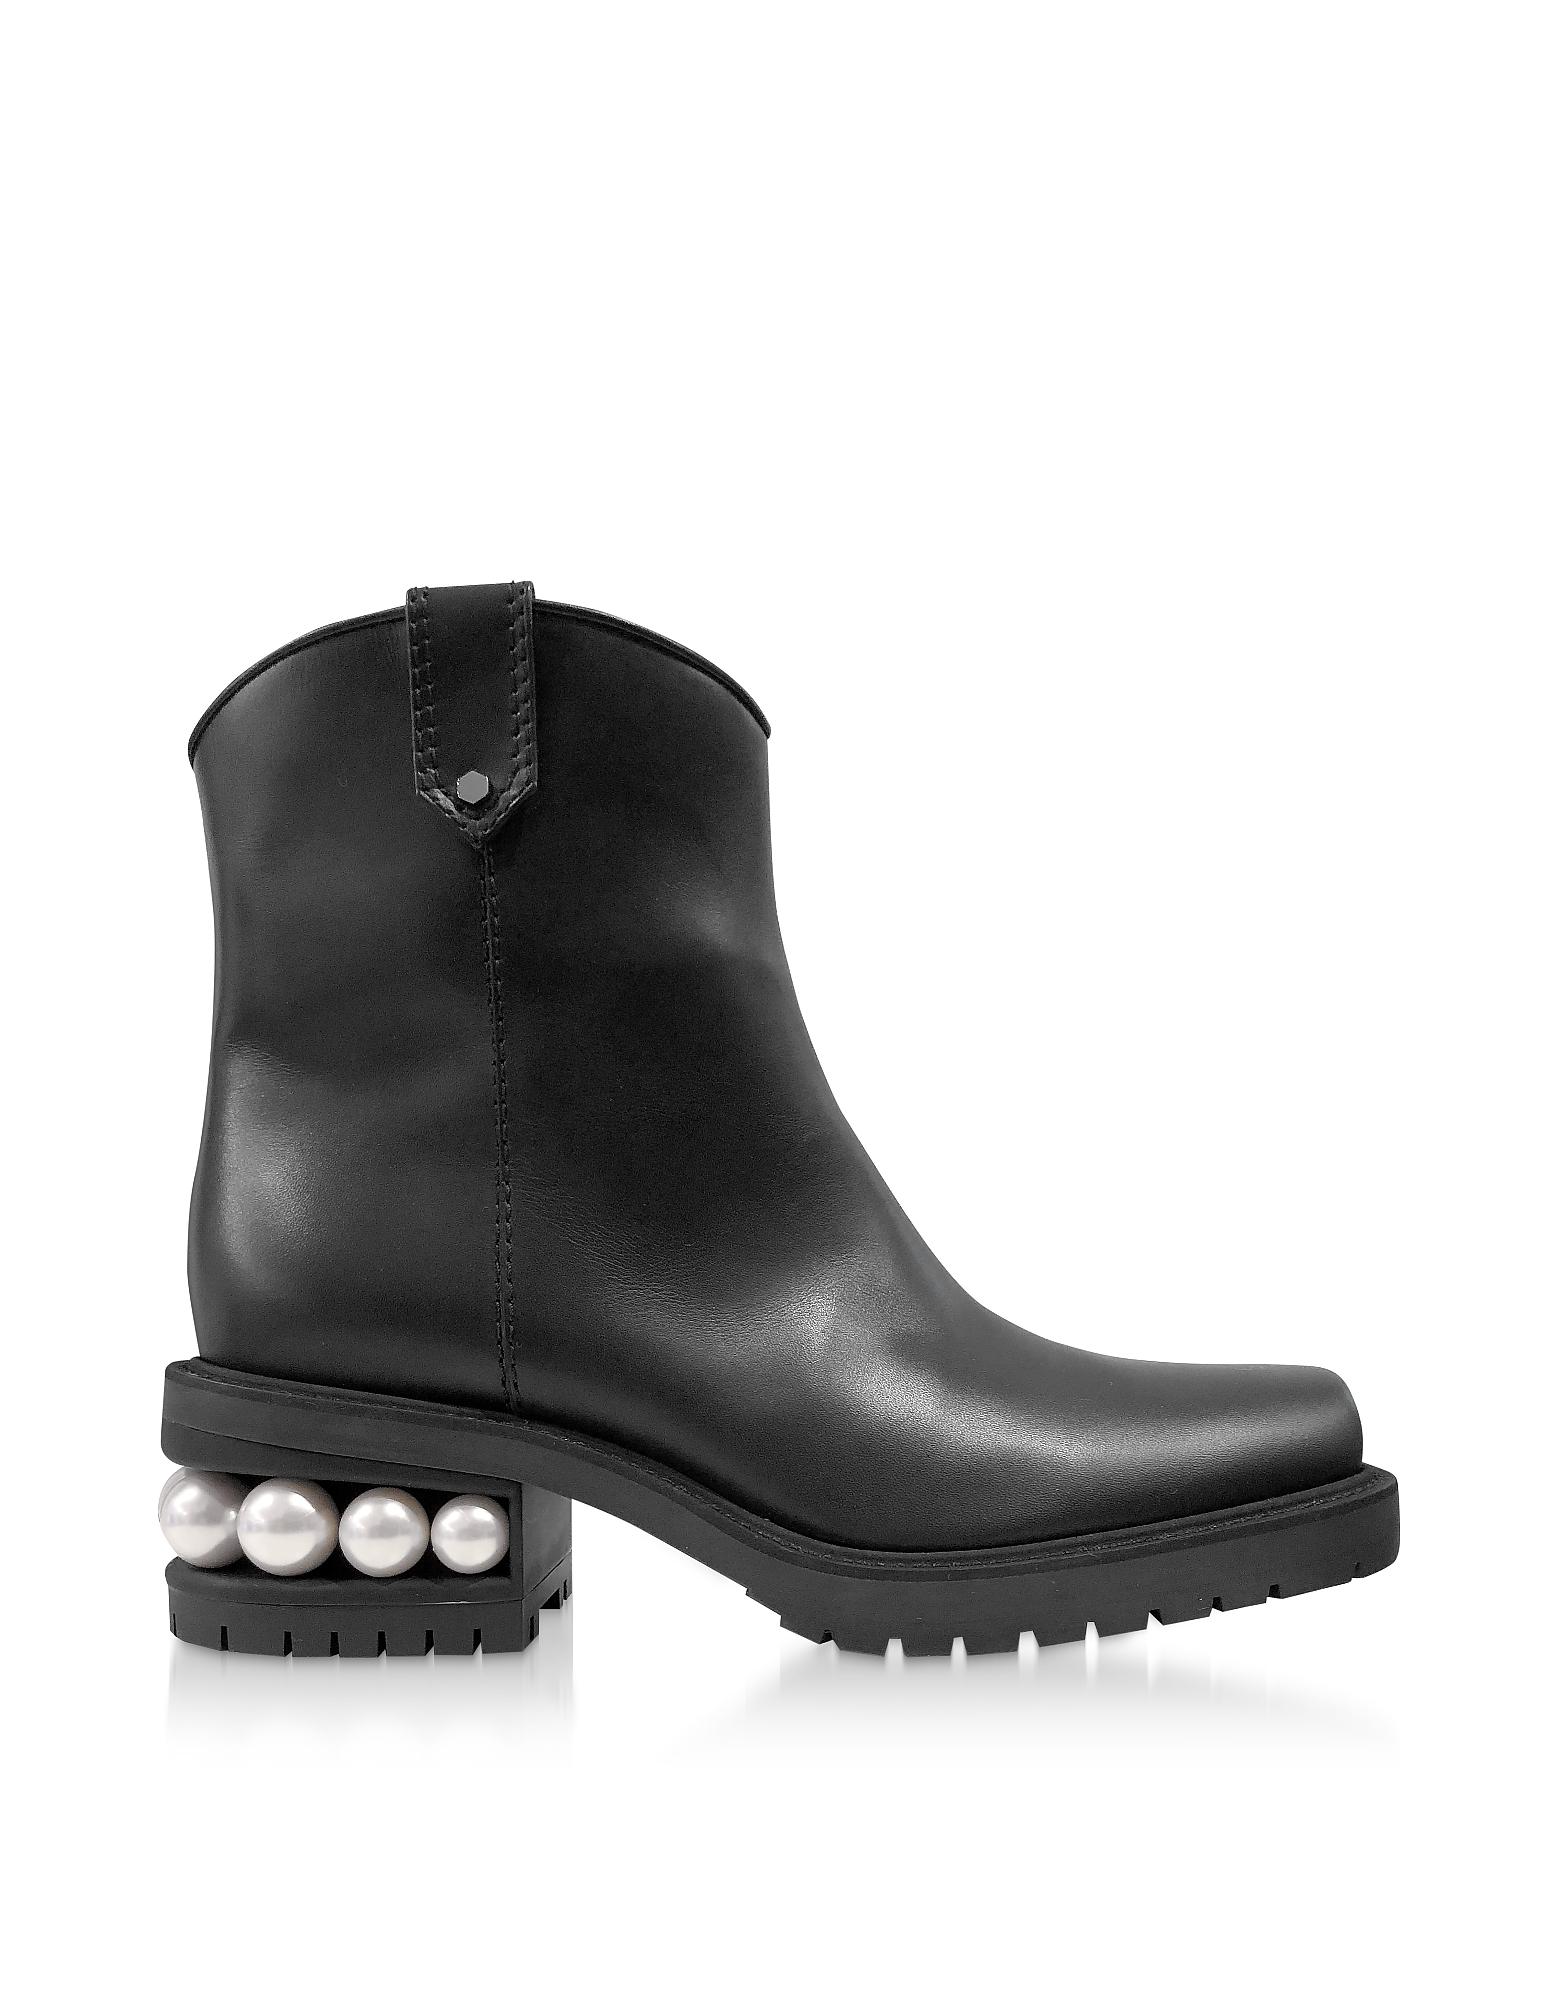 Nicholas Kirkwood Boots BLACK 35MM CASATI WESTERN ANKLE BOOTS